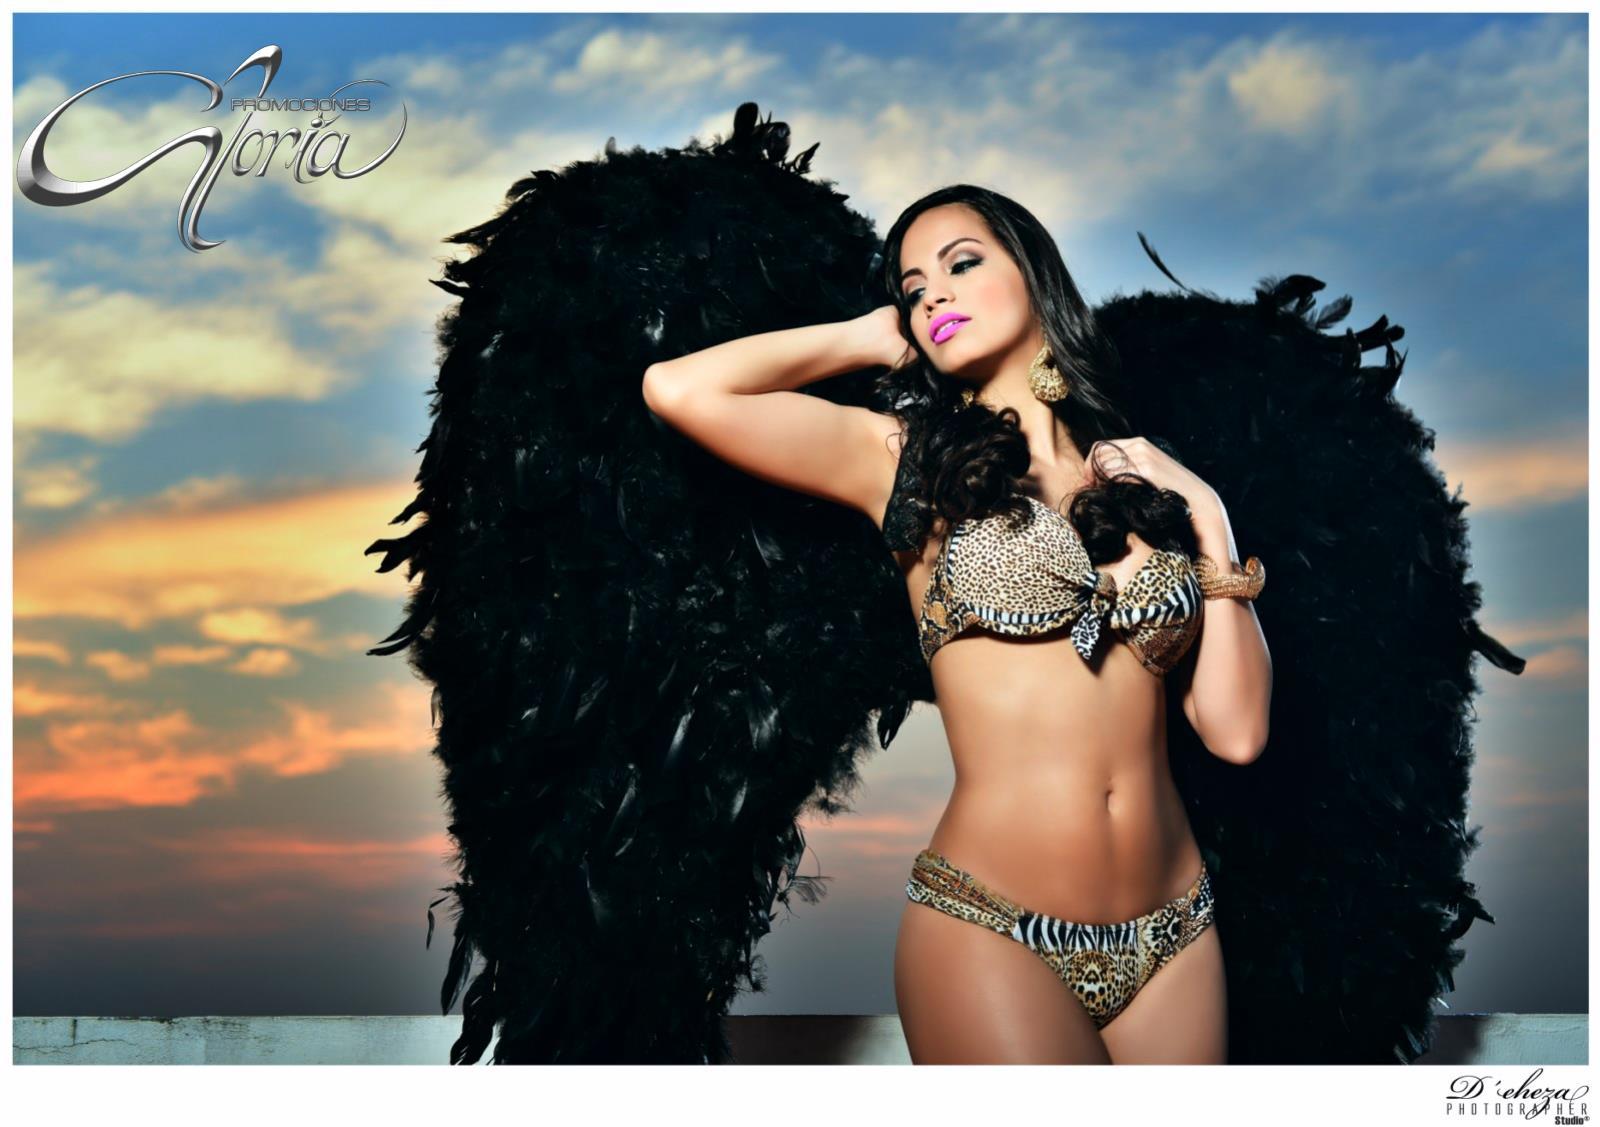 Fotos Maria Fernanda Padilla naked (64 photos), Topless, Cleavage, Boobs, bra 2006